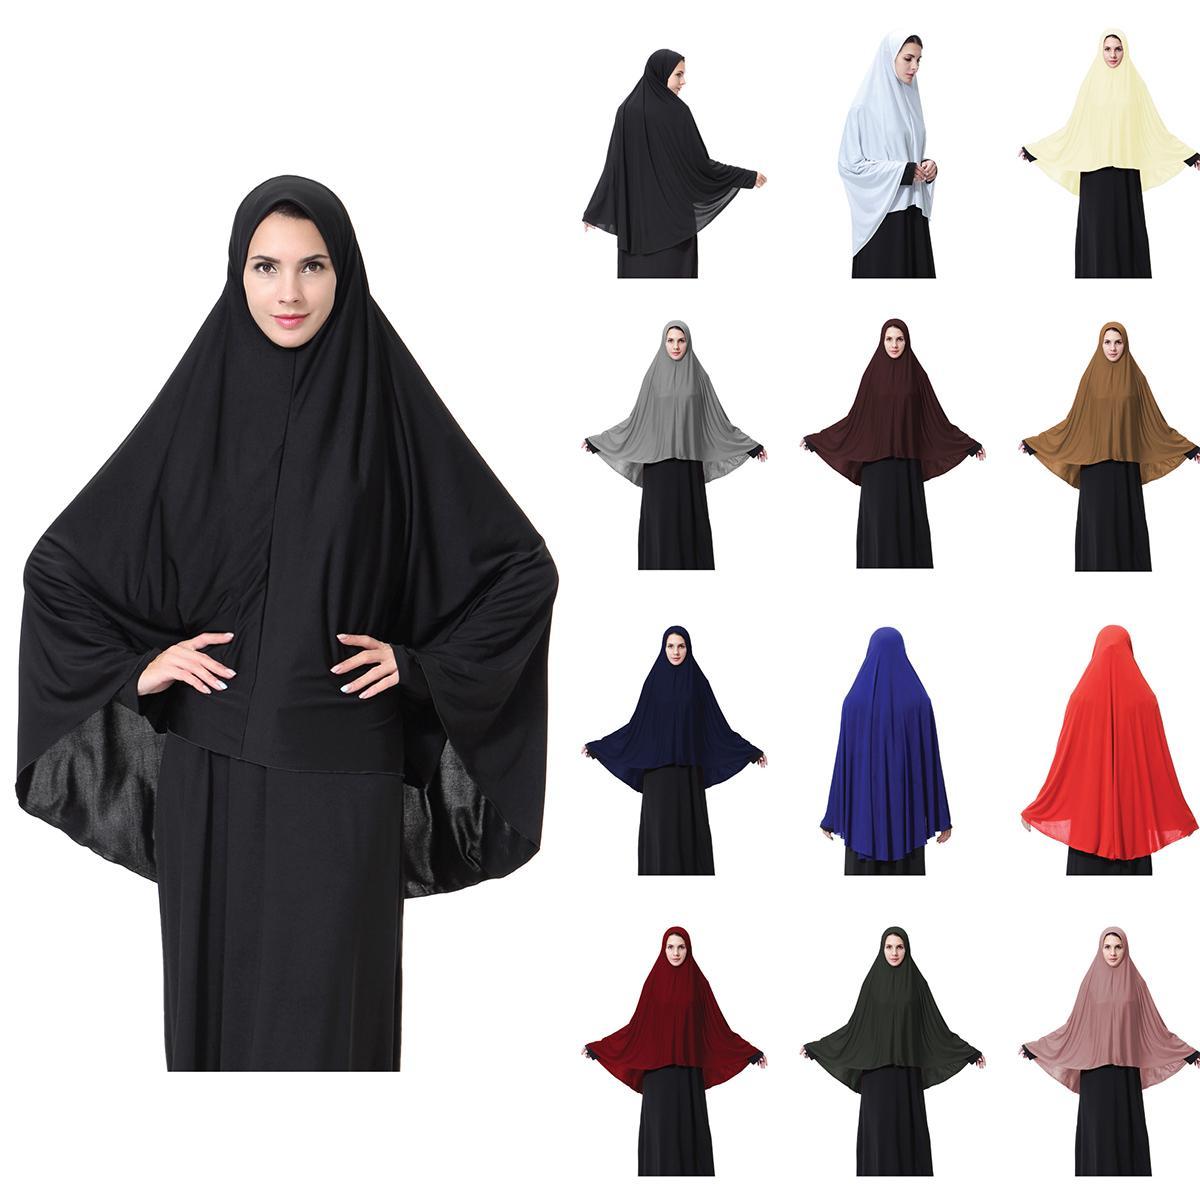 Muslim Face Cover Niqab Burqa Islamic Khimar Long Hijab Scarf Jilbab Prayer Clothing Headscarf Arab Ramadan Worship Service New